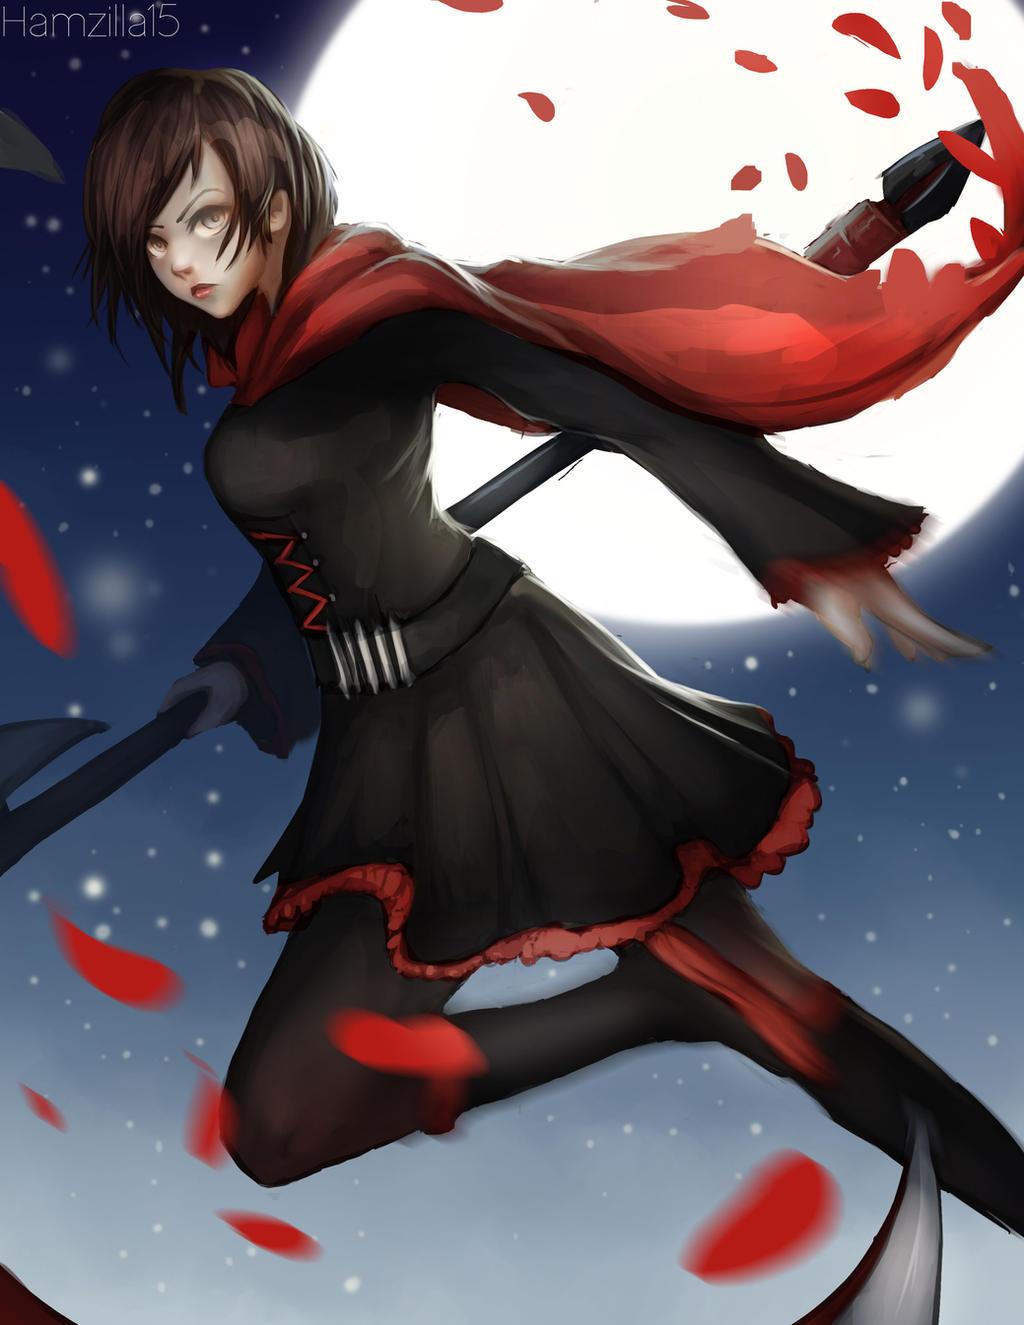 Ruby Rose vol.4 [By 紗倉シホ 通販始めました pixiv] : RWBY  |Ruby Red Fan Art